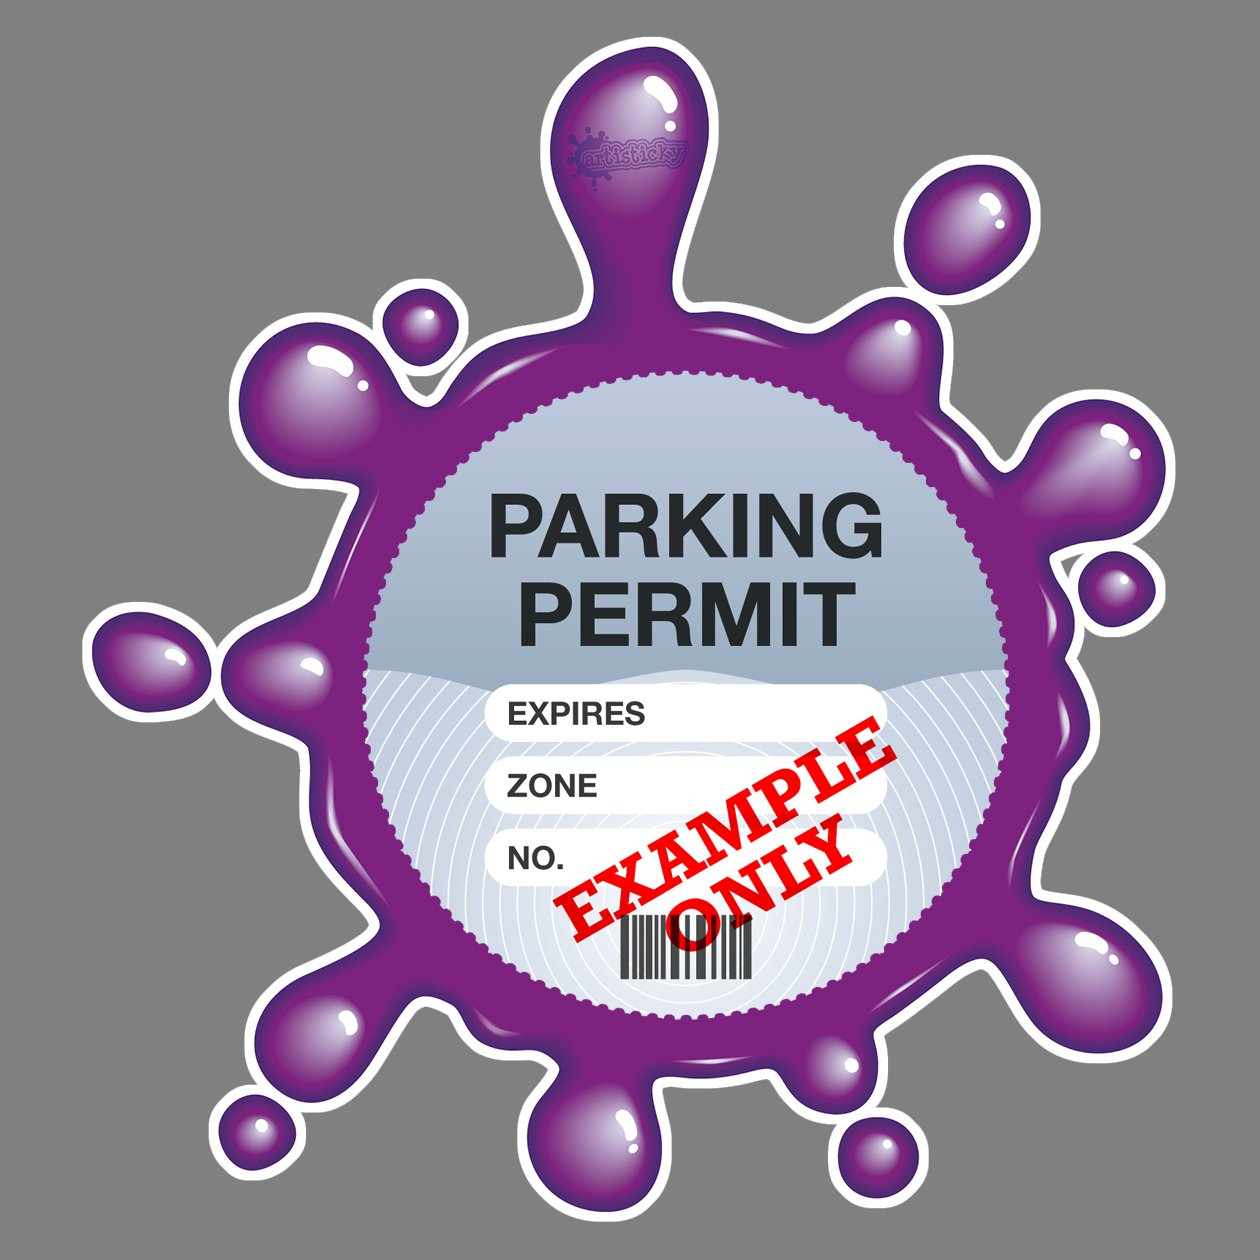 Parking Permit Holder Skin PURPLE SPLAT - FREE POSTAGE Artisticky AS-0015